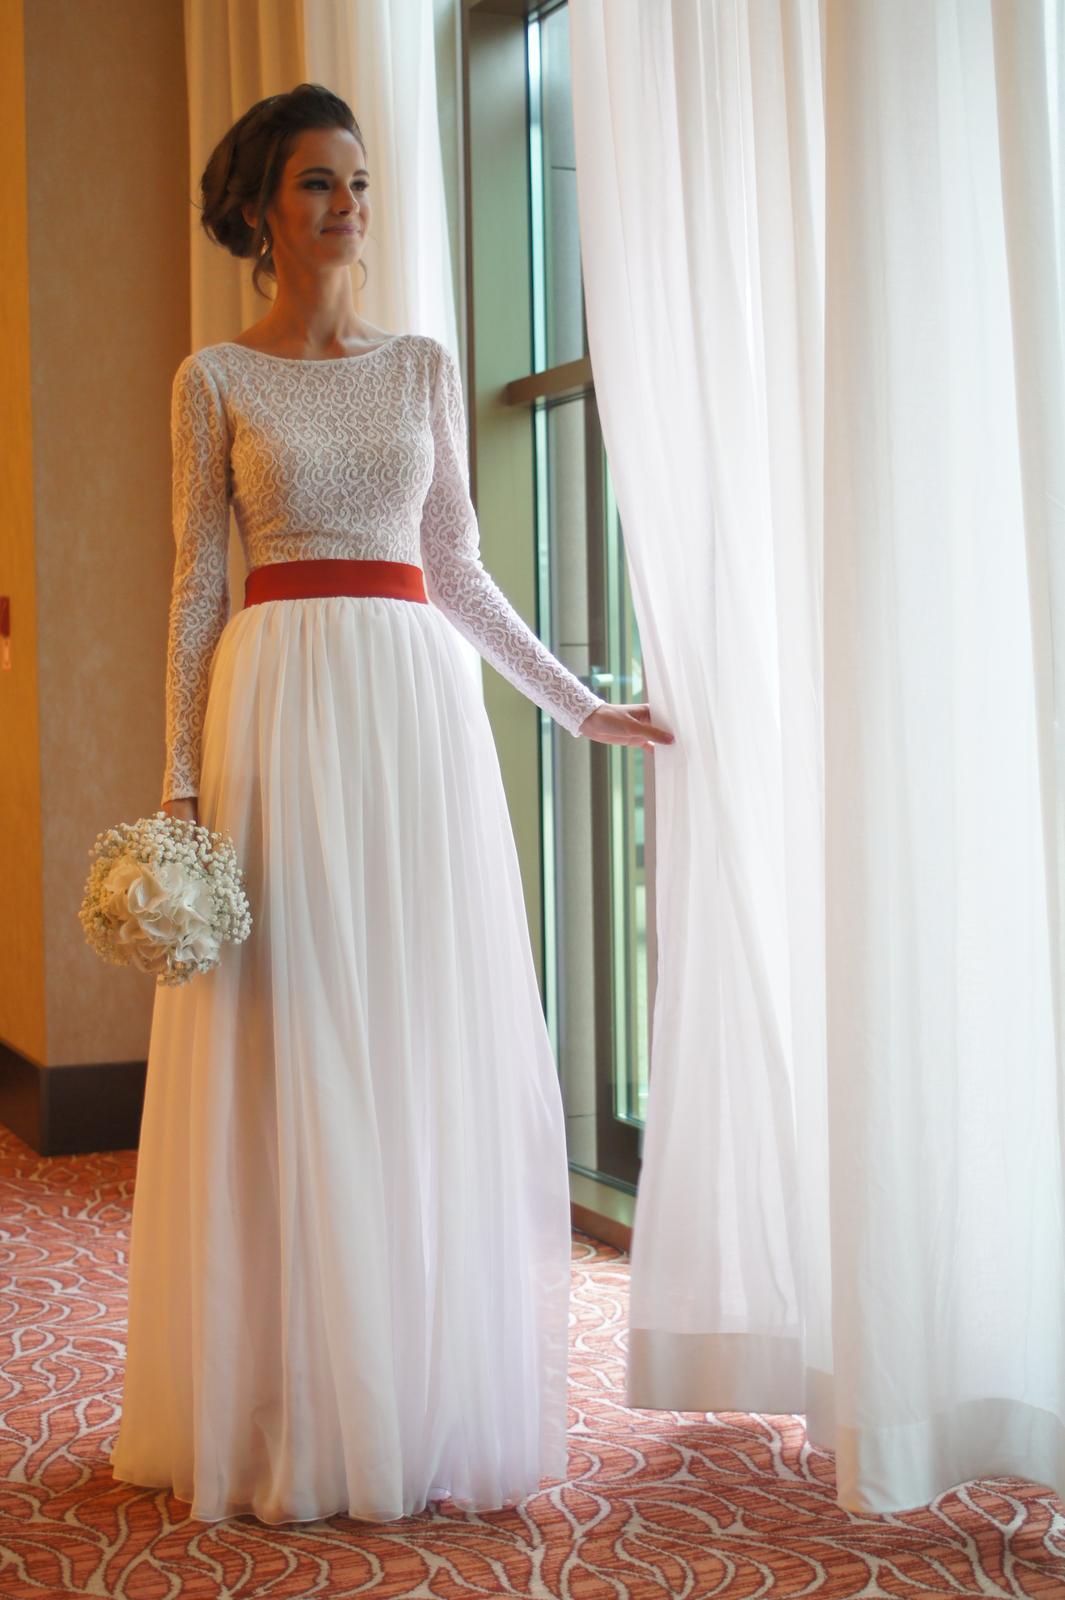 65e6a44af Jednoduché pohodlné svadobné šaty, 34 - 700 € | Svadobný bazár |  Mojasvadba.sk